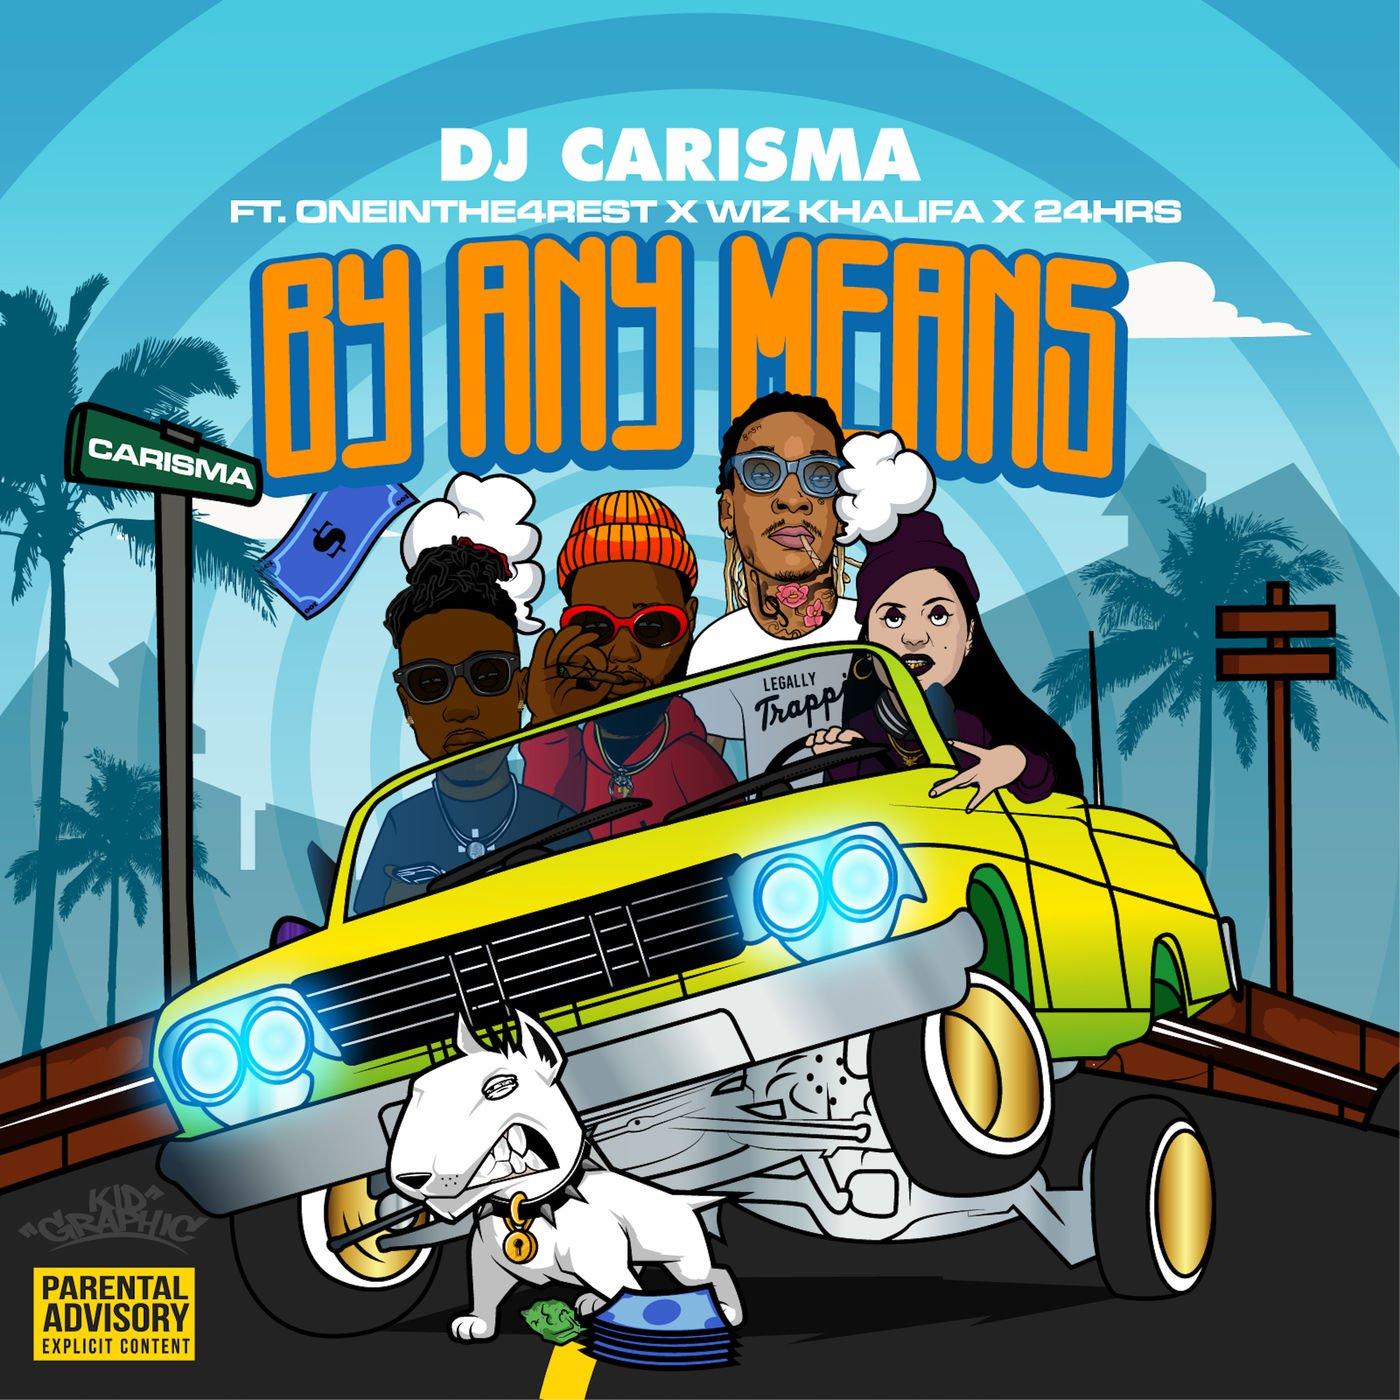 DJ Carisma – By Any Means (feat. Wiz Khalifa, OneInThe4Rest & 24hrs)